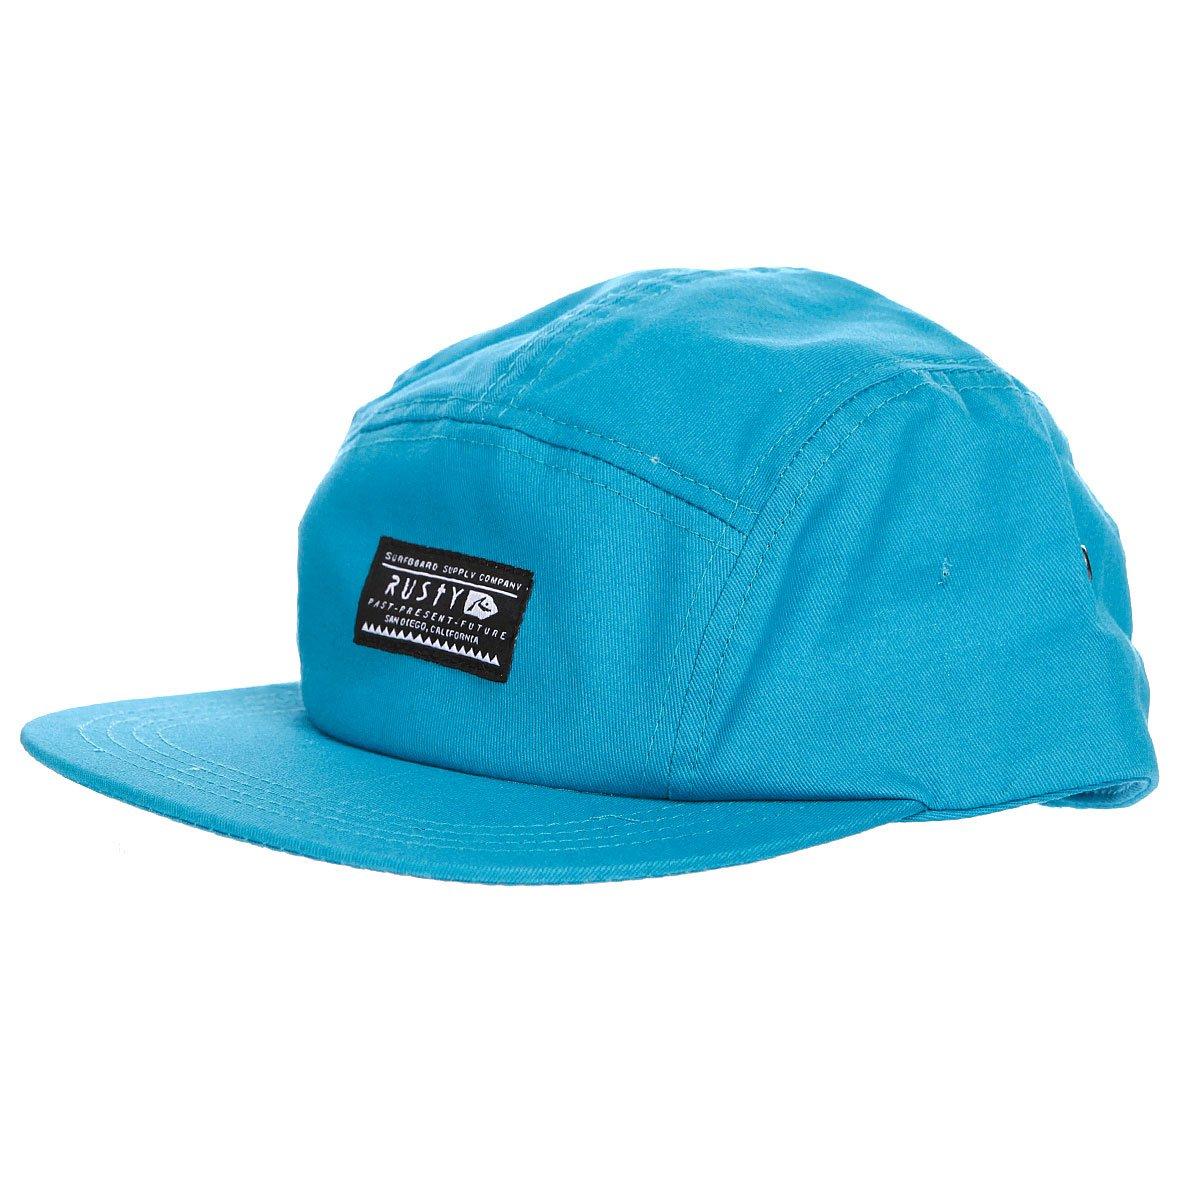 Бейсболка пятипанелька Rusty Fiver Adjustable Mineral Blue ...